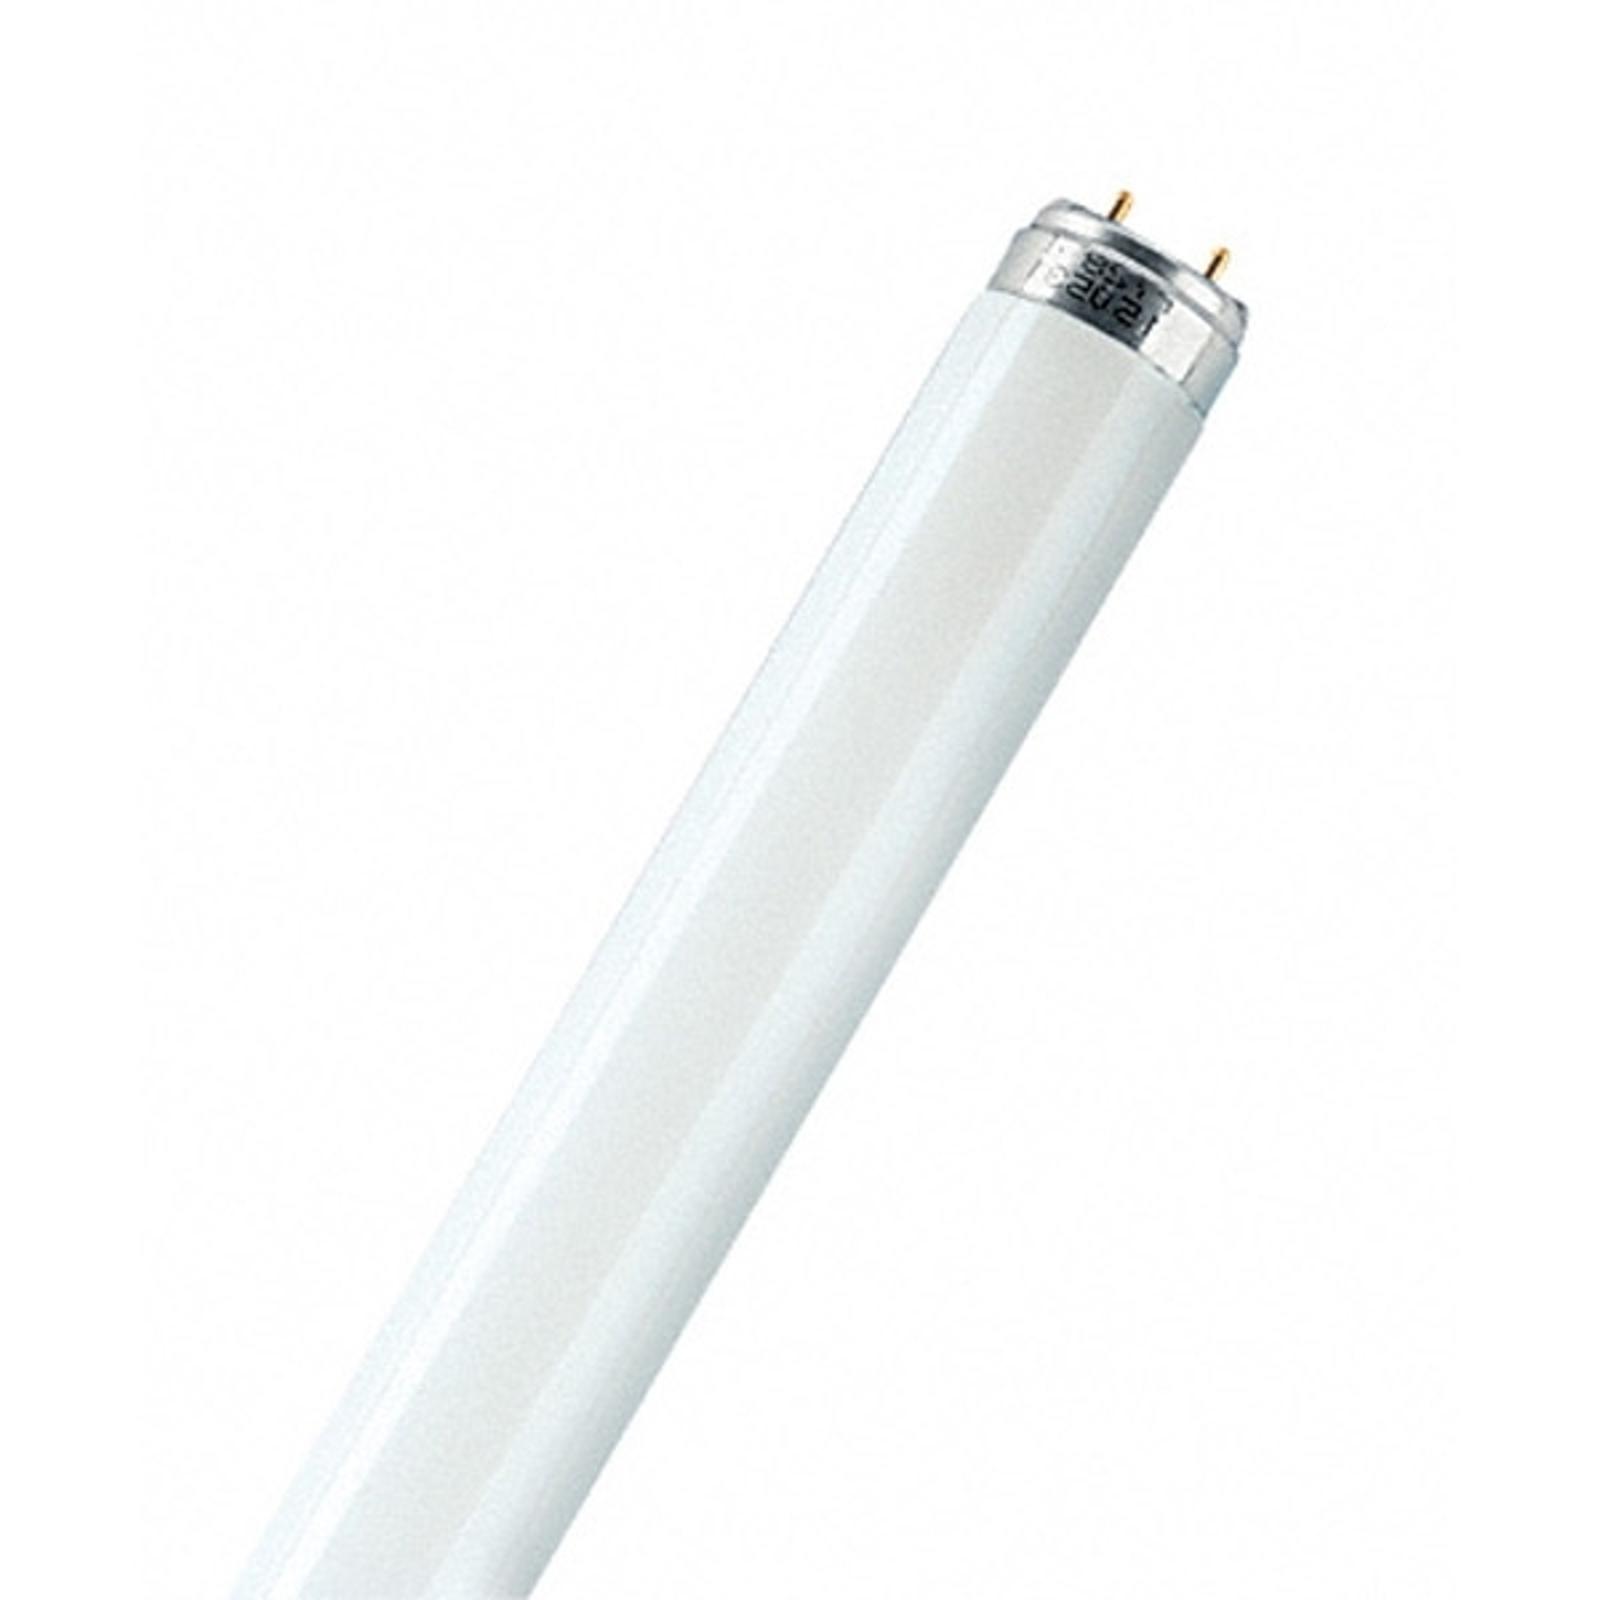 G13 T8 32W 830 LUMILUX ES lysstofrør